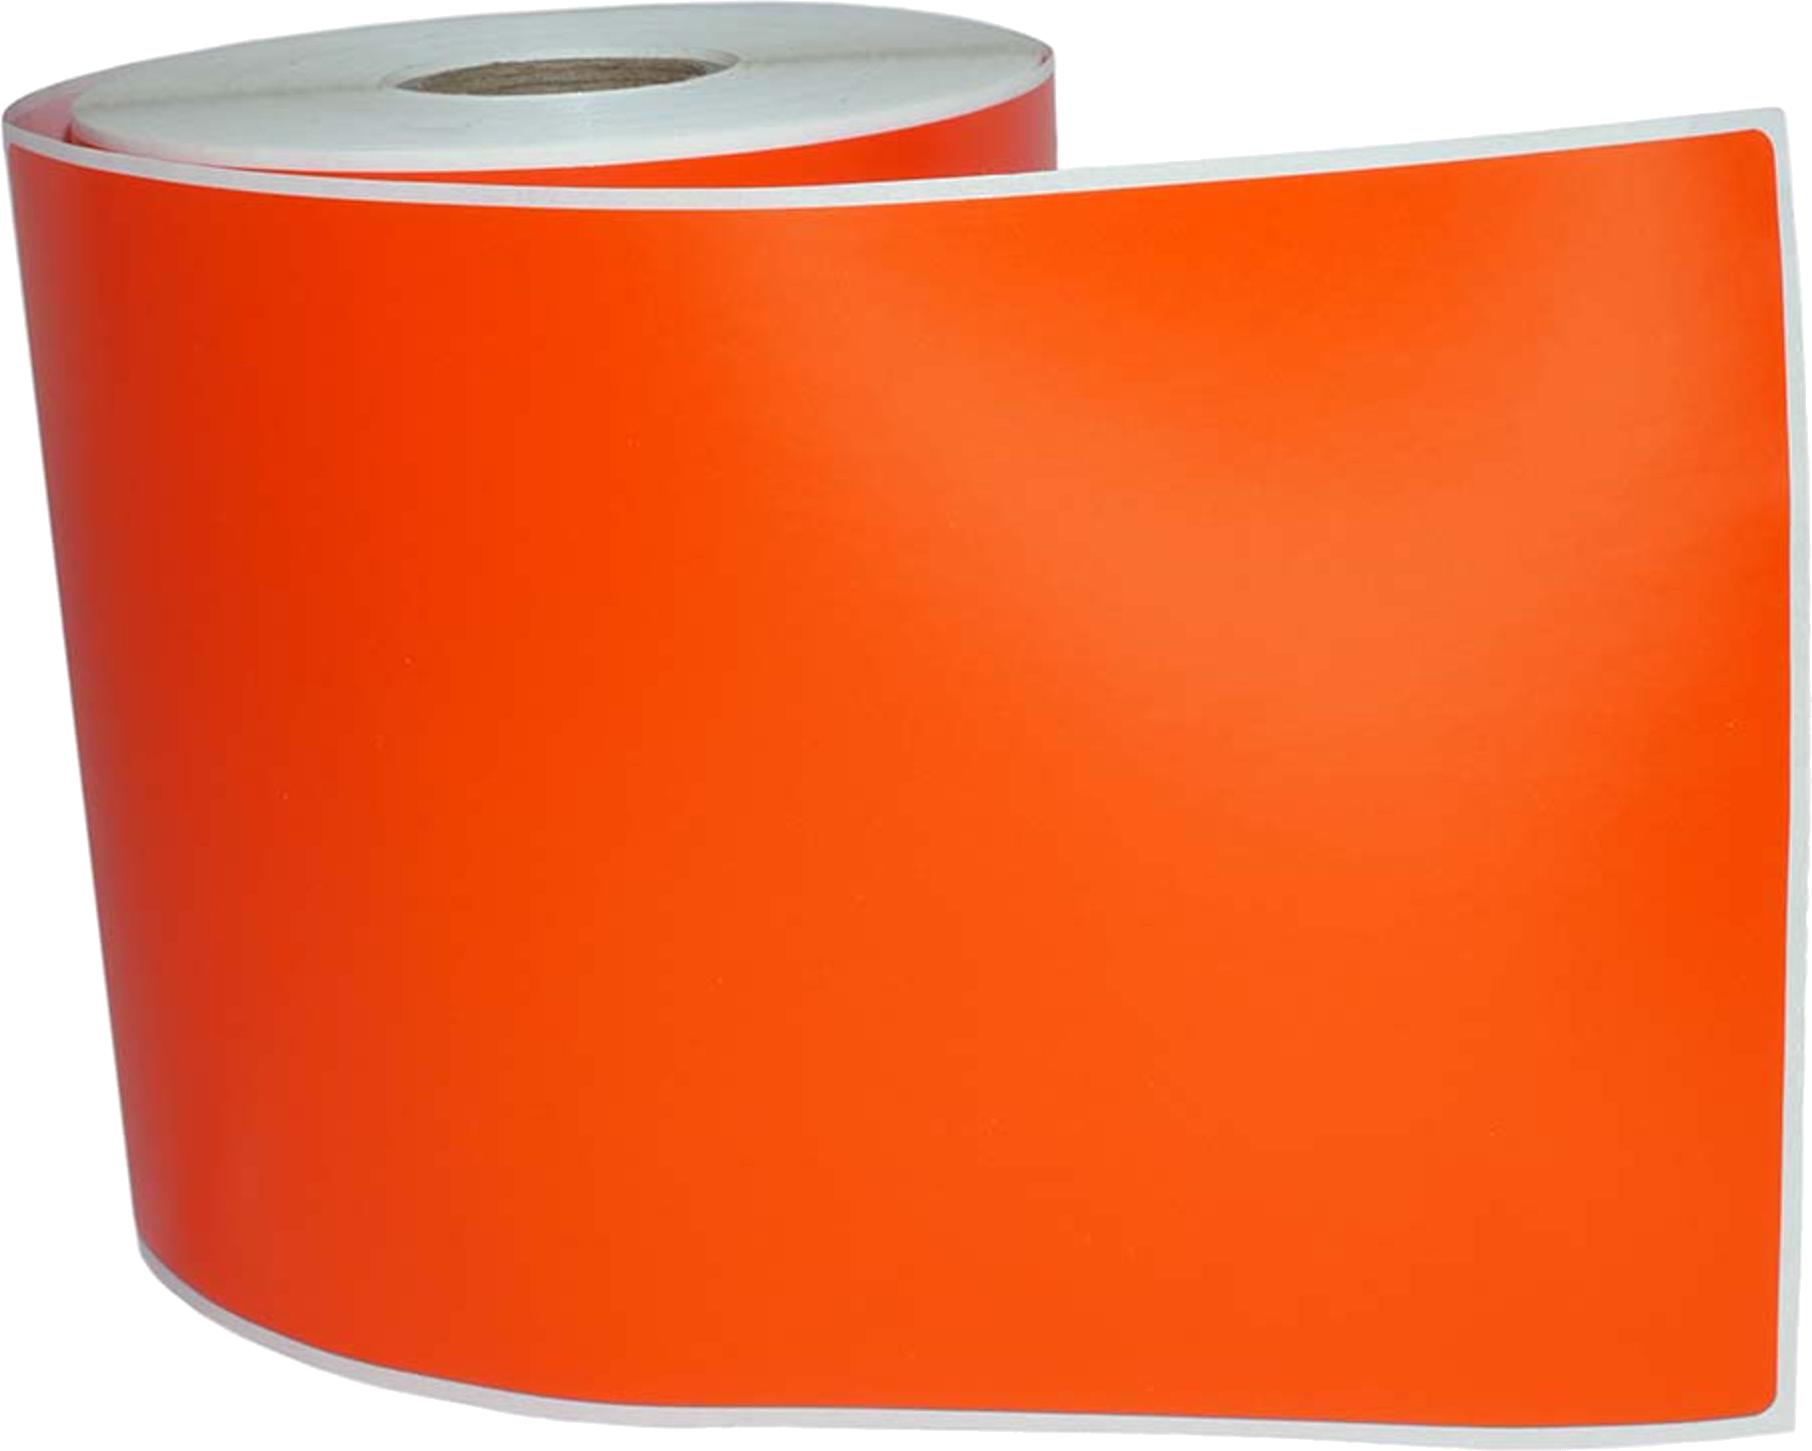 Huismerk Zebra verzendetiketten 102x150 oranje